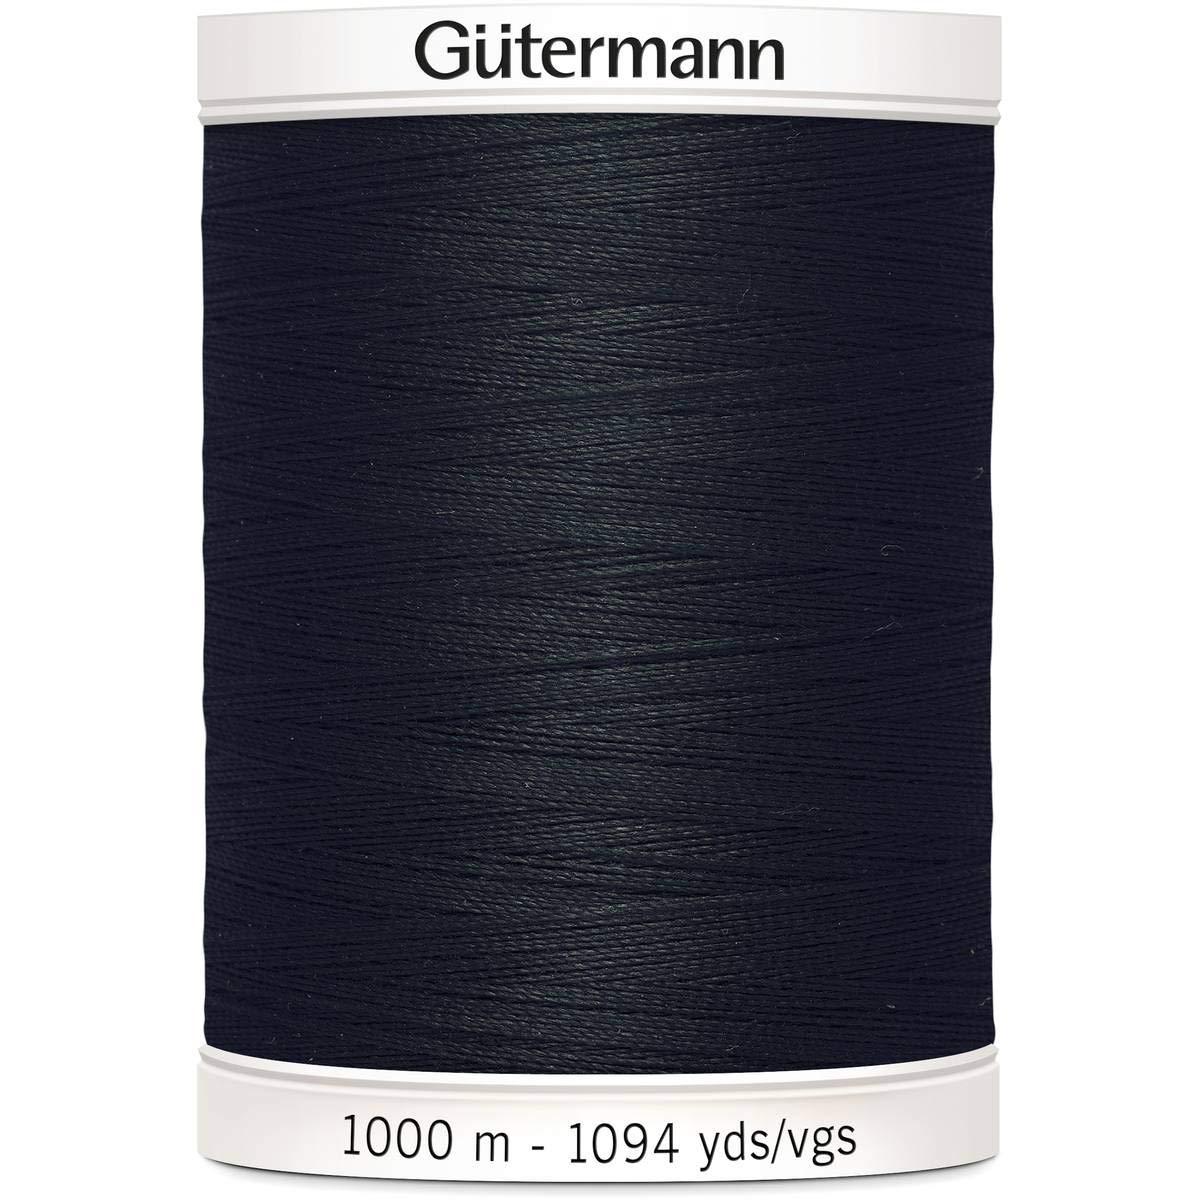 Gutermann Sew-All Thread, Polyester, Black, 1000 m GUT_701939-000-1